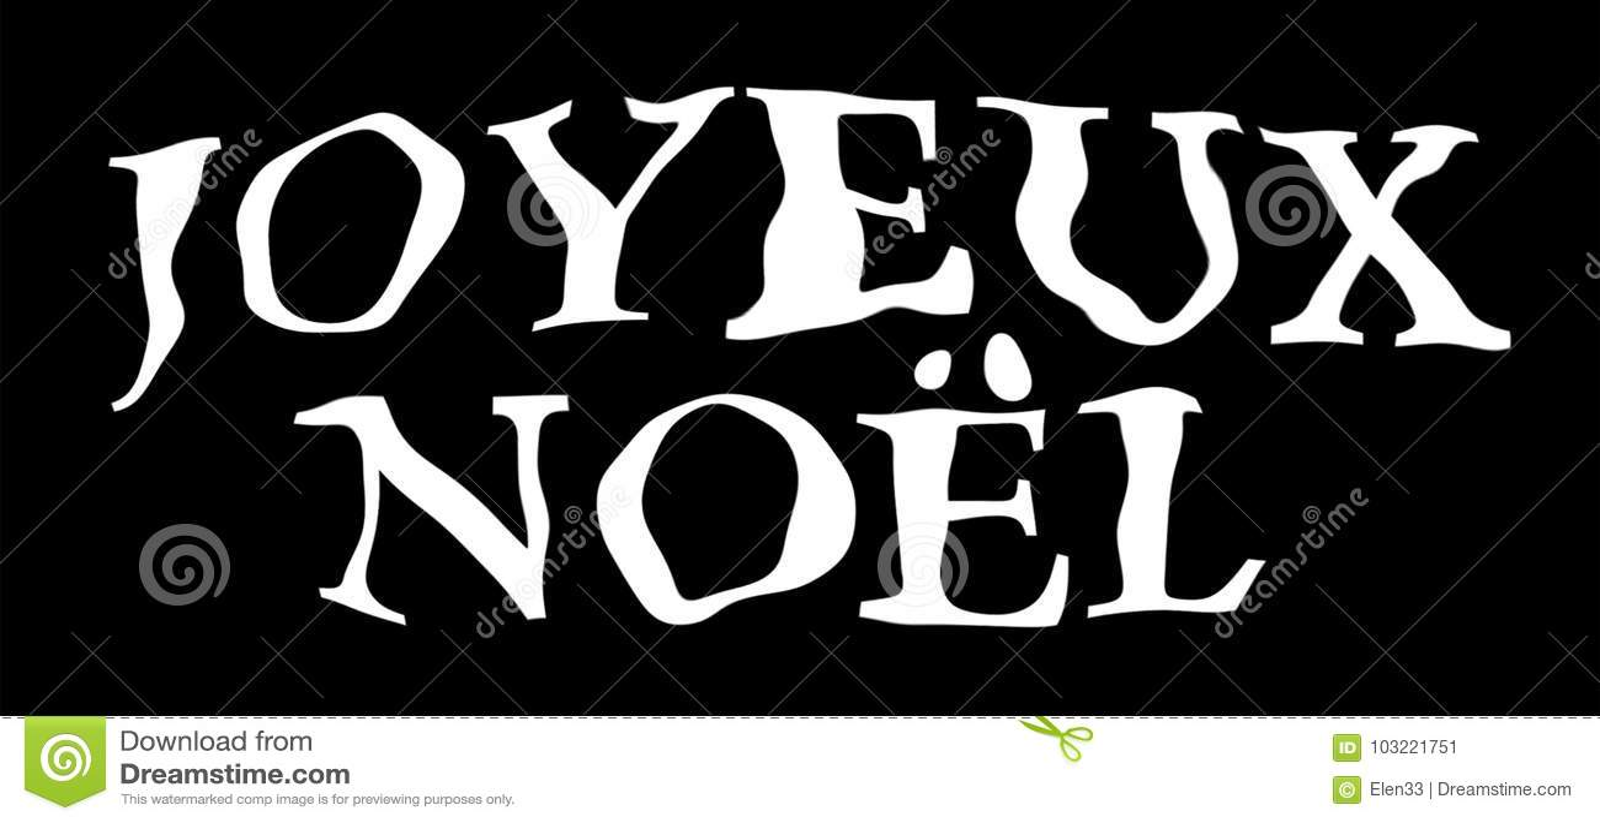 Joyeux Noel Stock Illustration Illustration Of Greetings 103221751